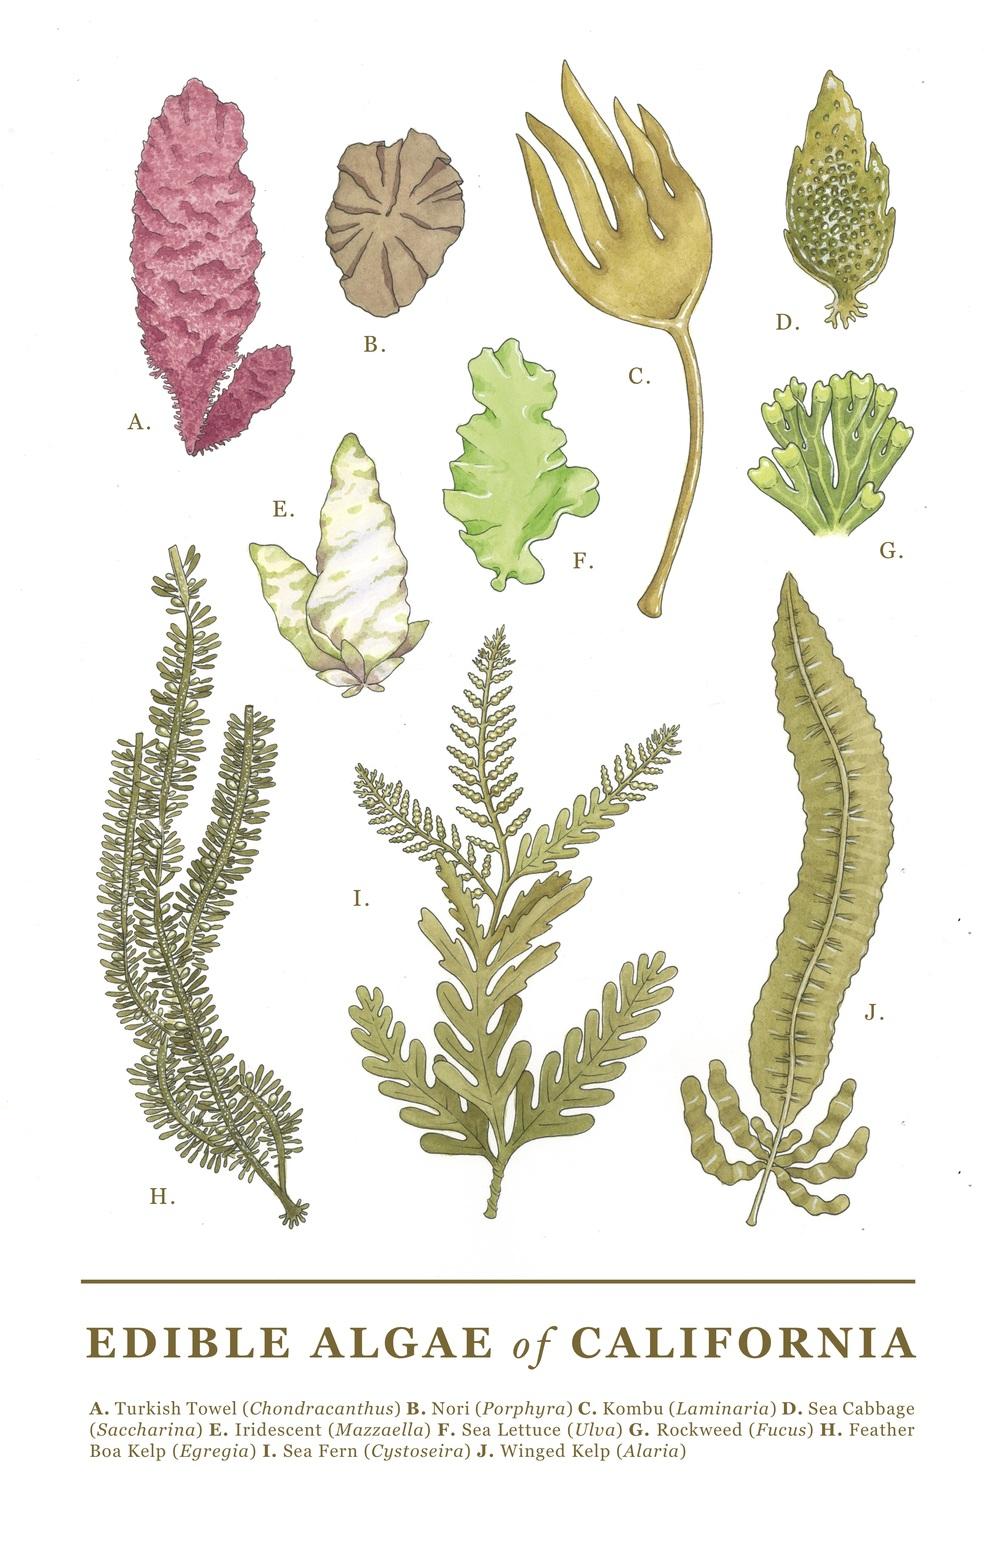 Edible Algae